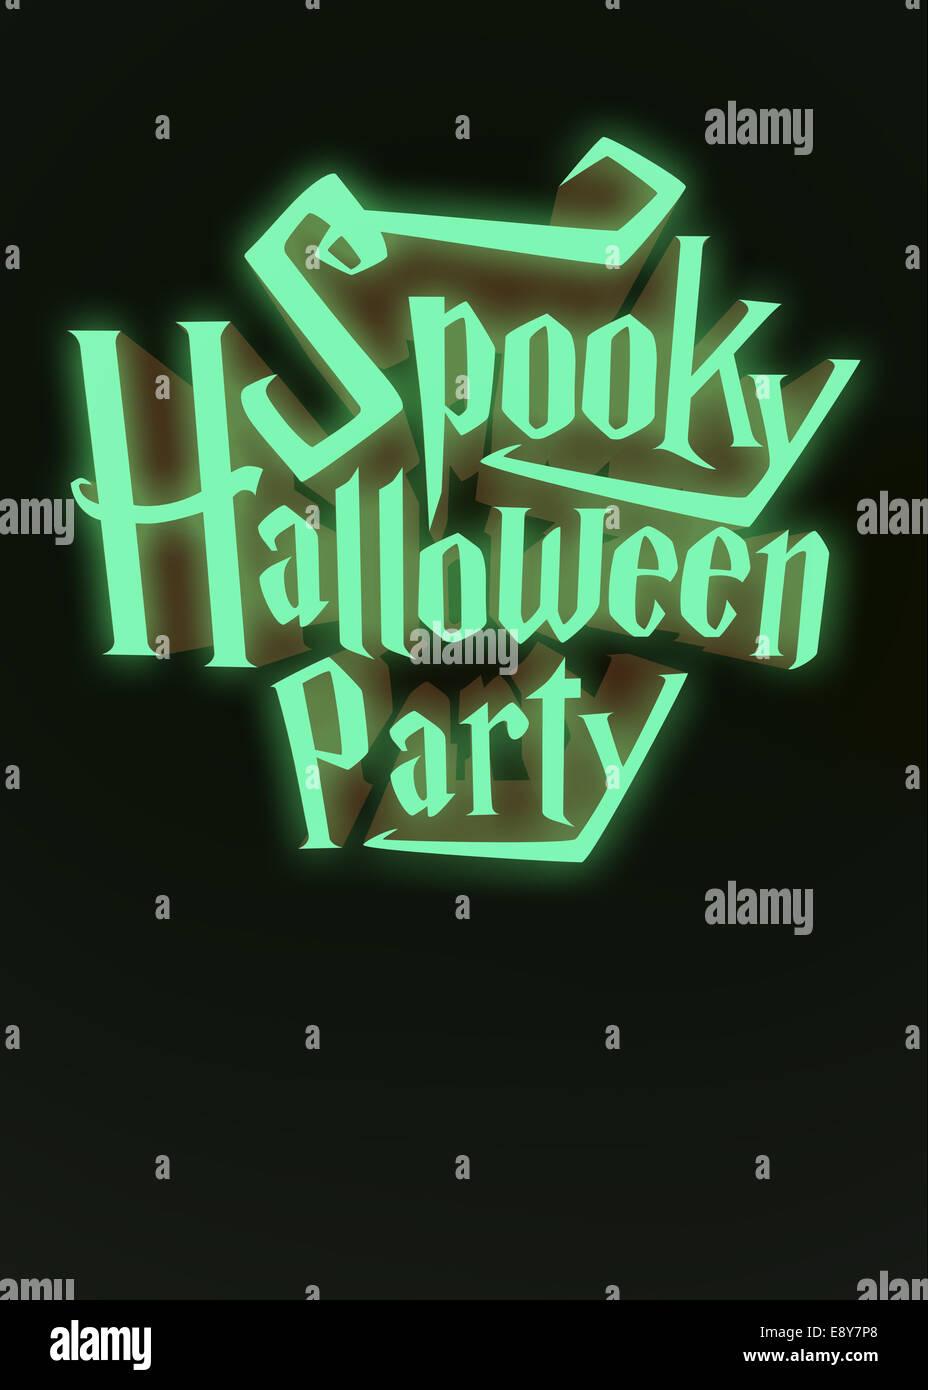 Halloween Neon Party Background Stock Photos & Halloween Neon ...